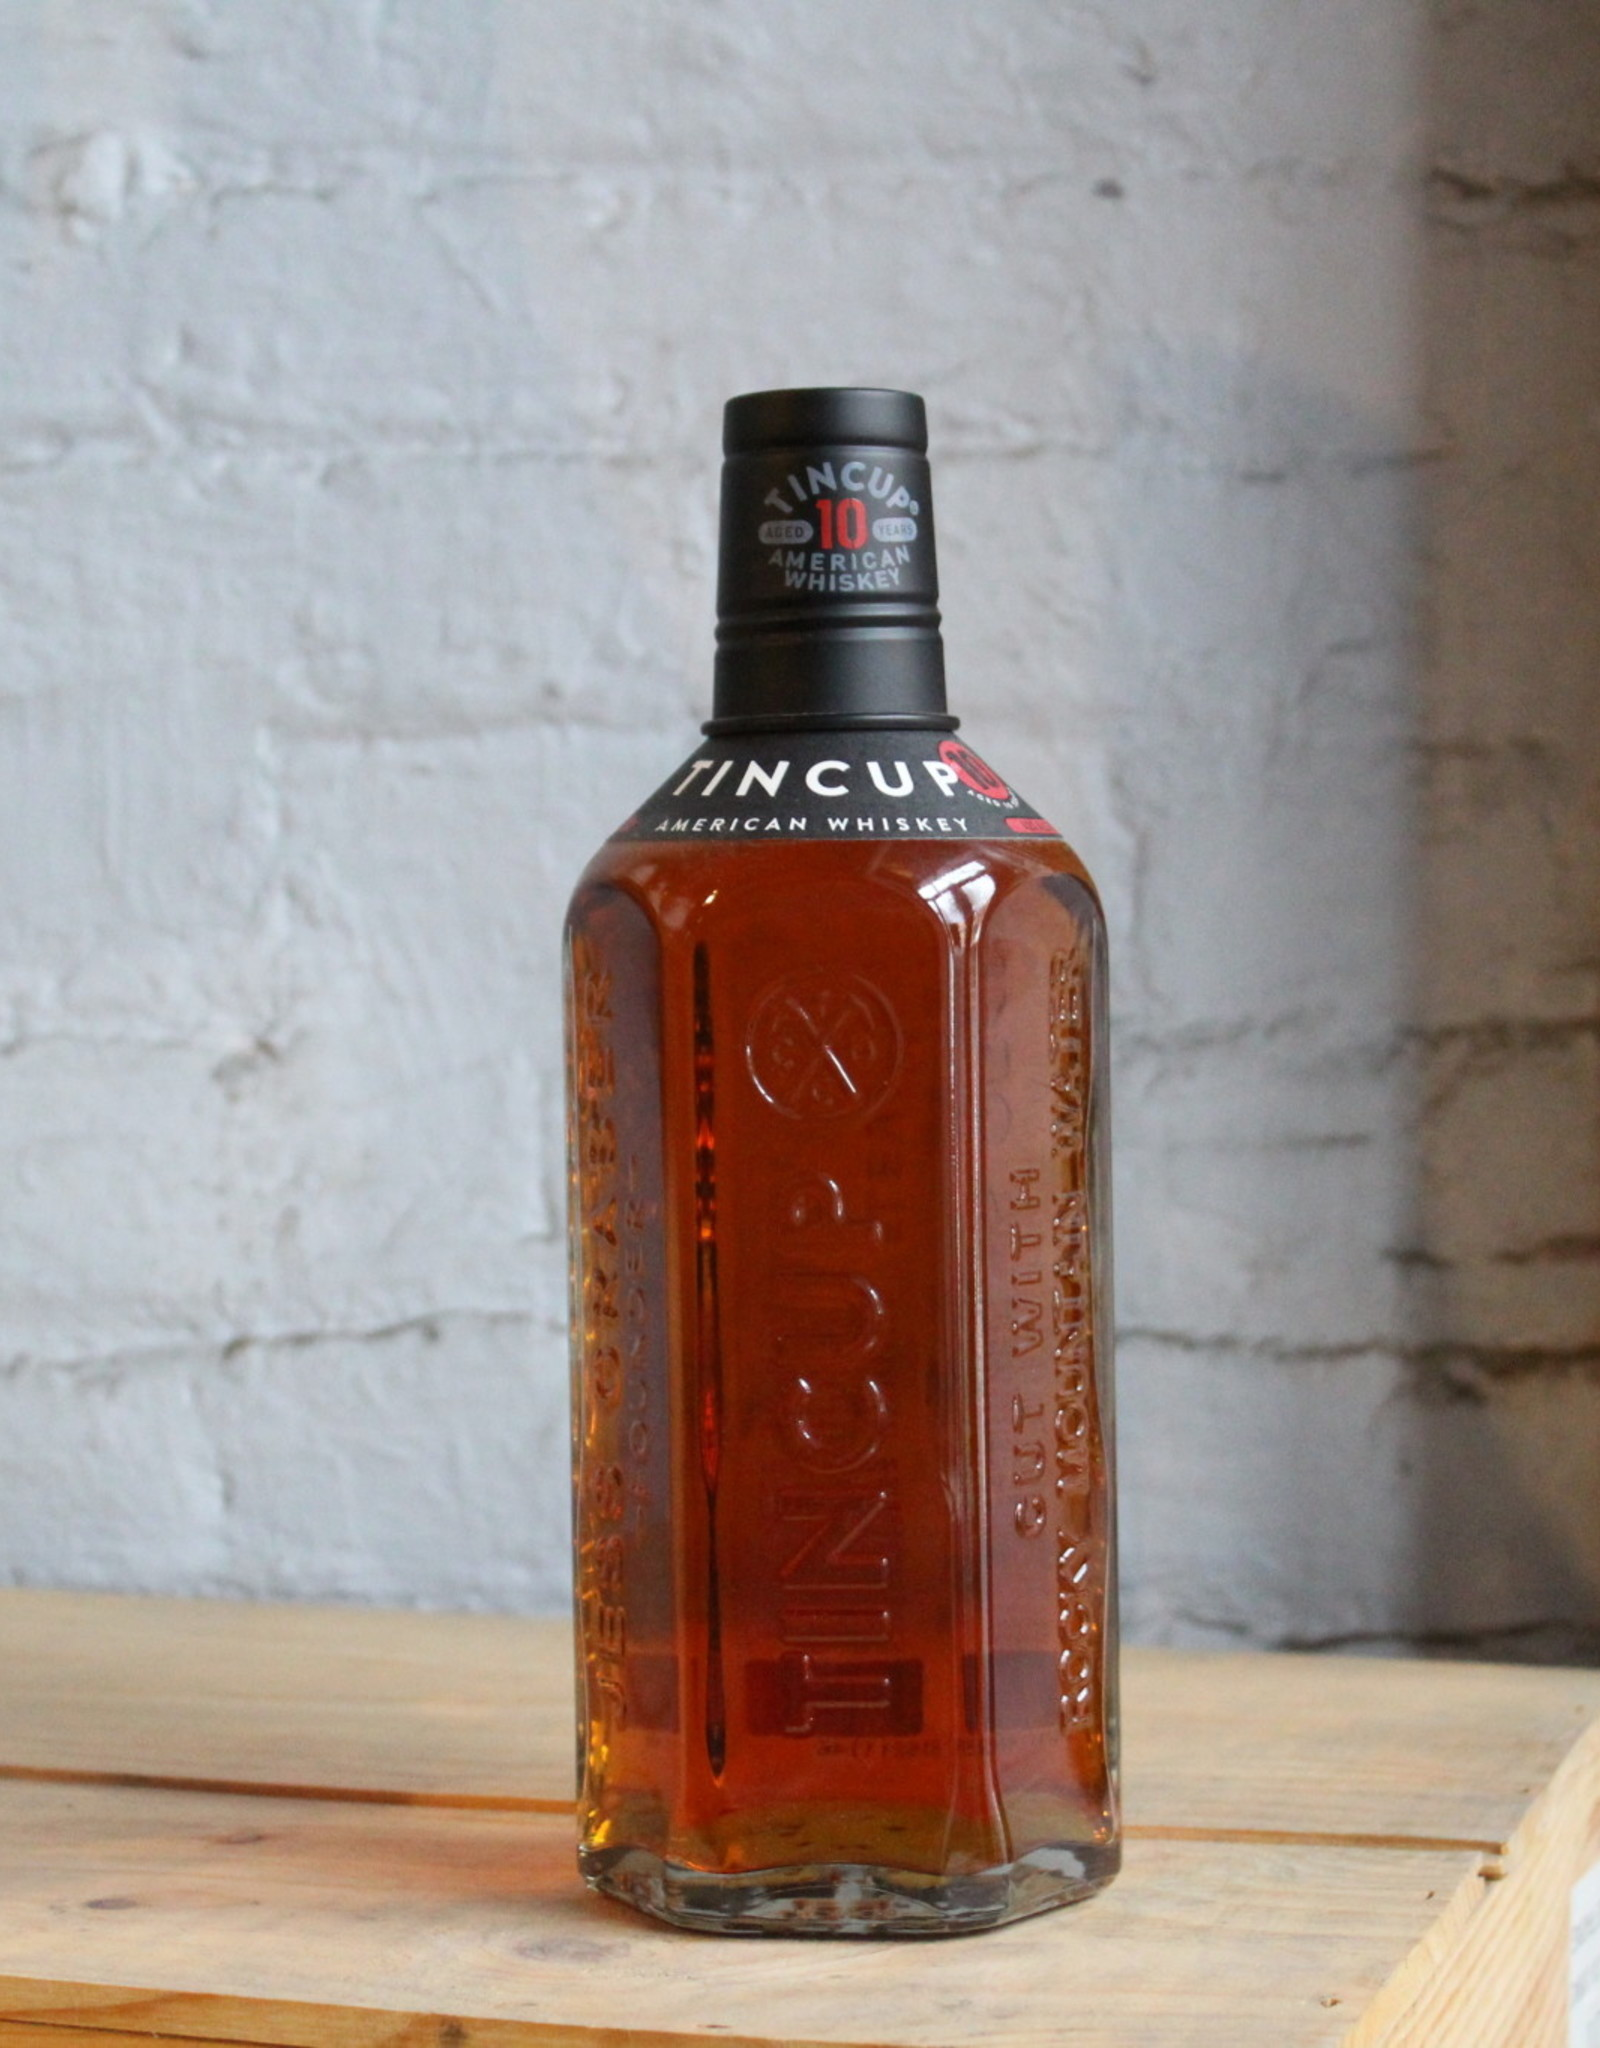 Tincup 10yr American Whiskey - Colorado (750ml)